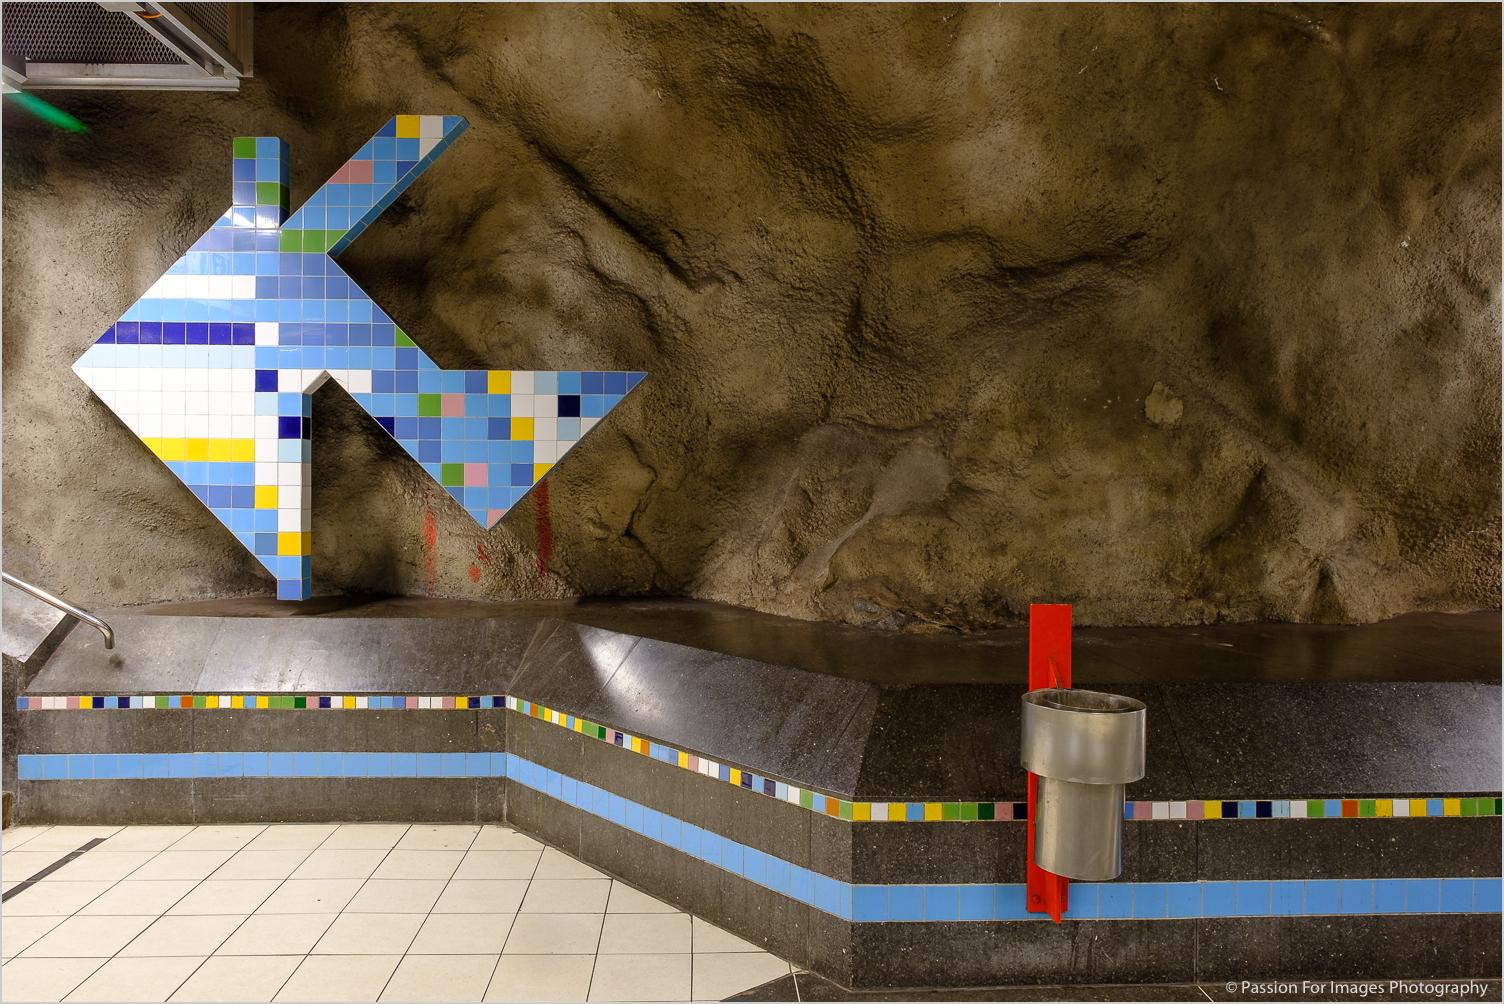 DSCF8872_2019_08_Skandinavien-Subway-Stockholm-Art-Project.jpg